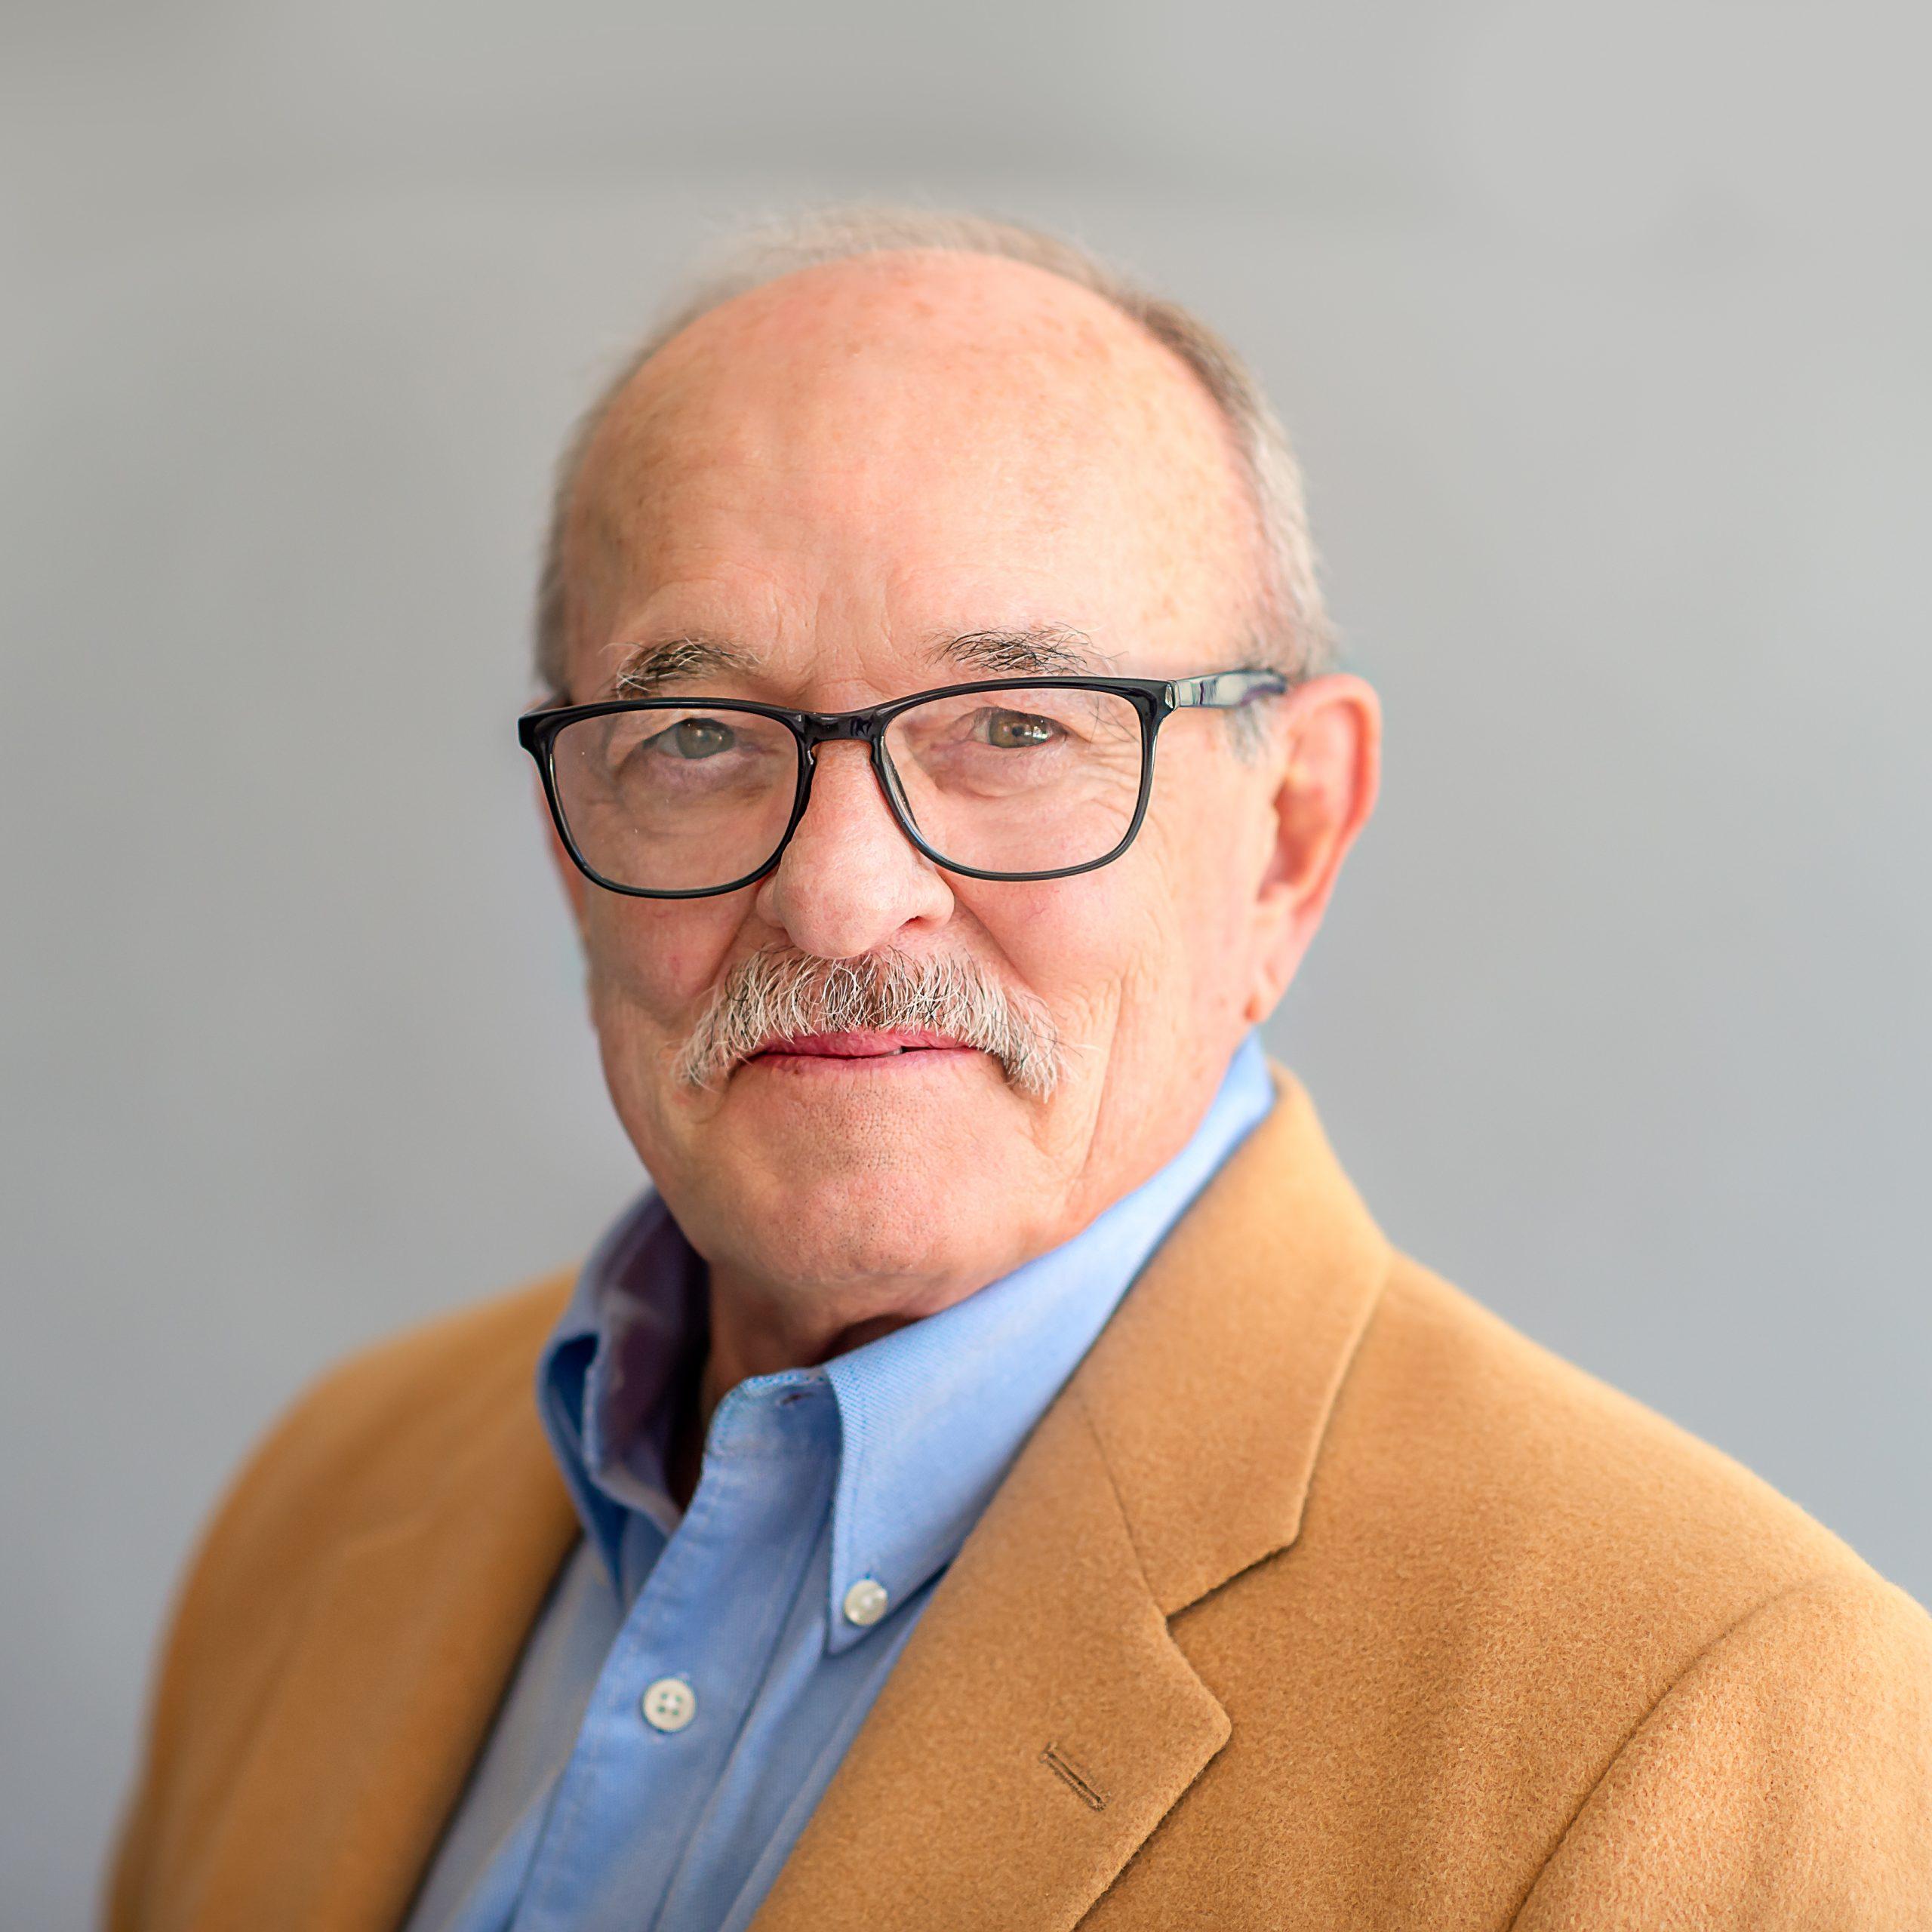 Kent Wohlrabe, MA, LCPC, CADC